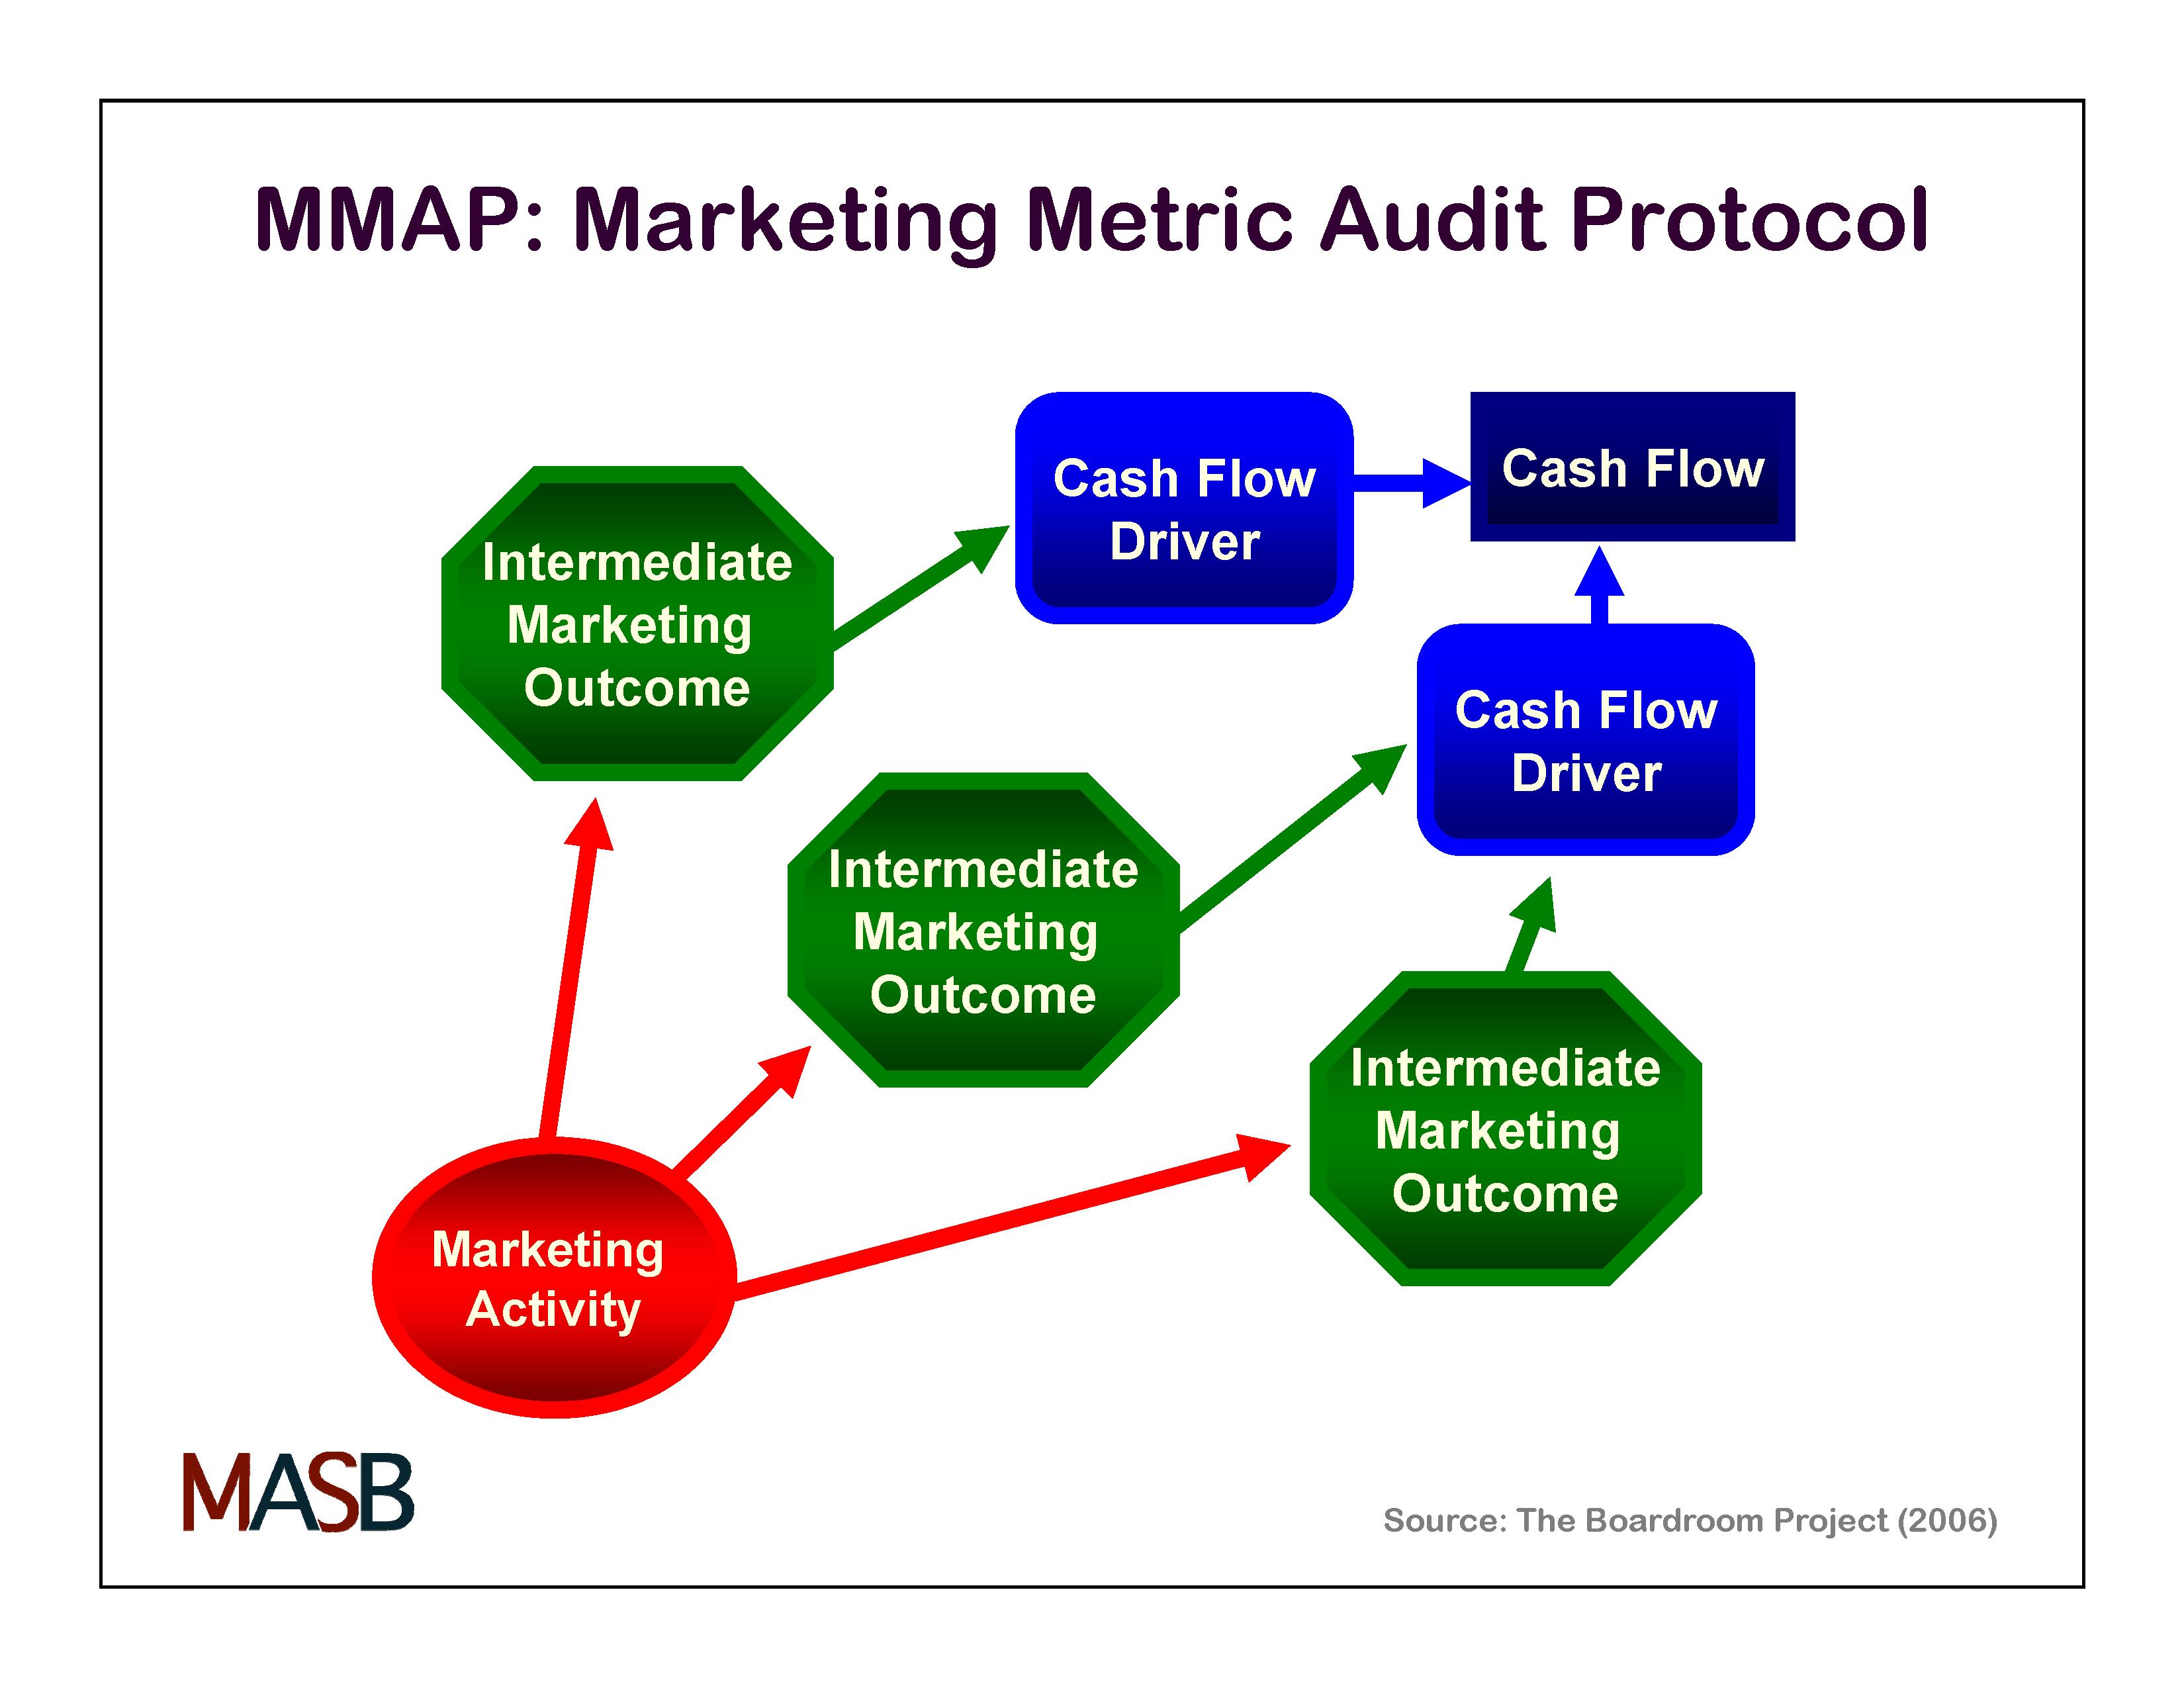 marketing metric audit protocol wikipedia